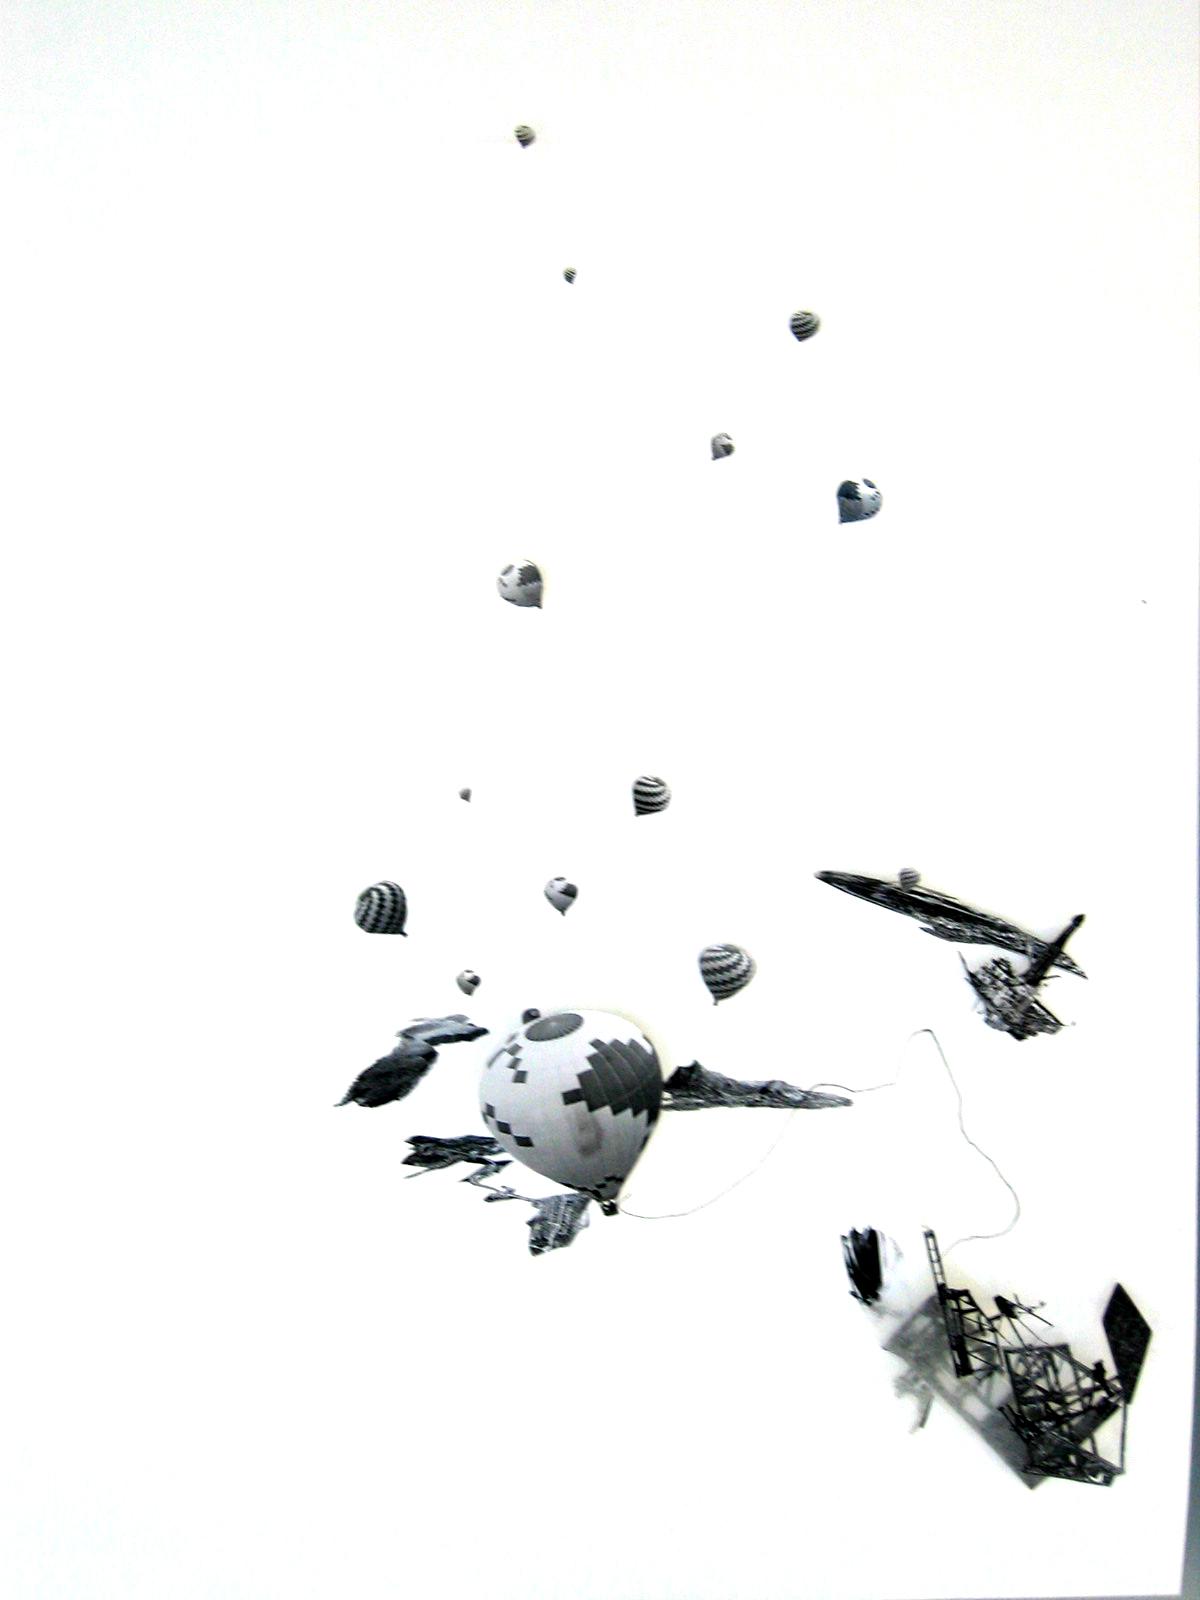 ballongferd.jpg